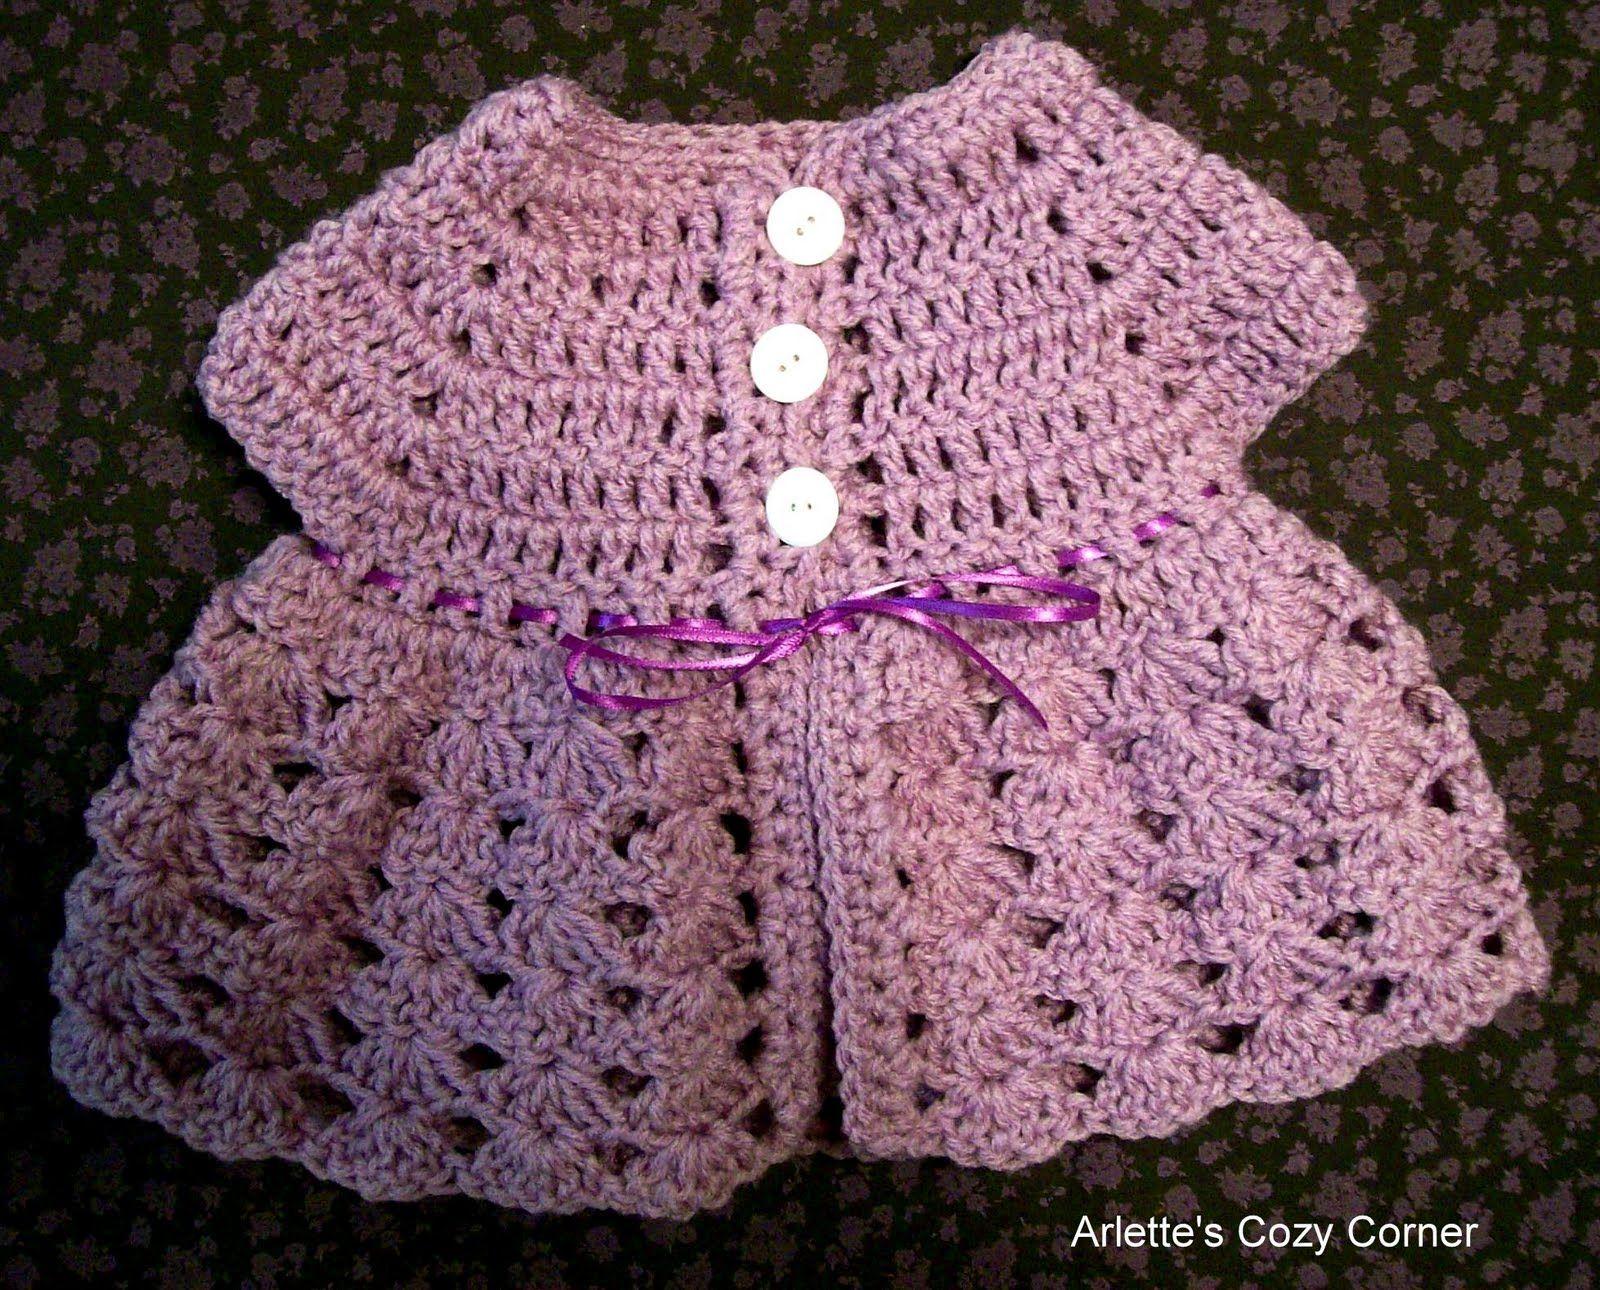 Free+Crochet+Baby+Sweater+Patterns | Video instructions: Crochet ...